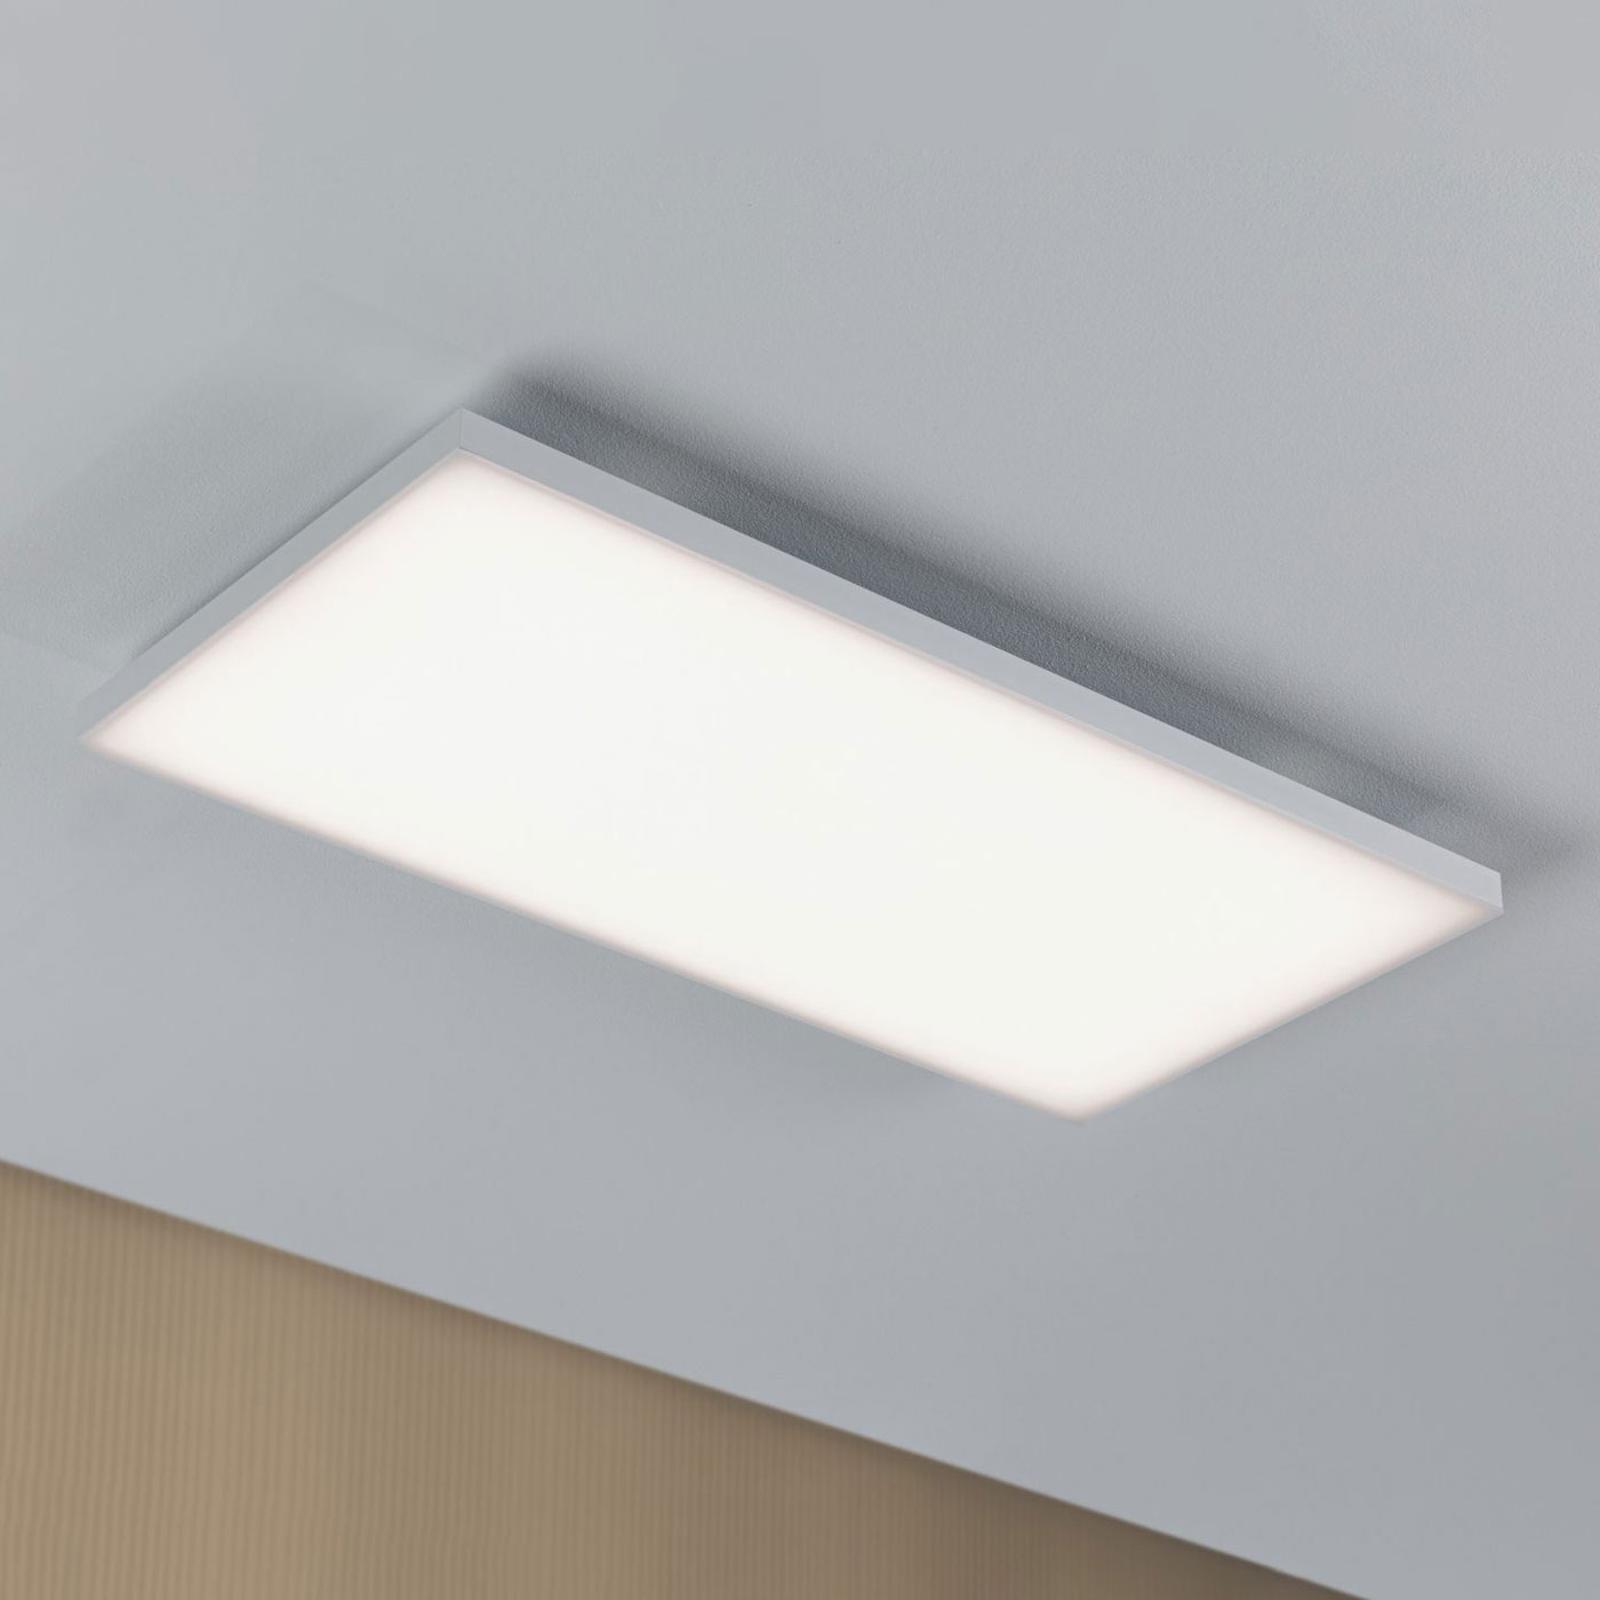 Paulmann Velora LED plafondlamp 59,5 x 29,5cm